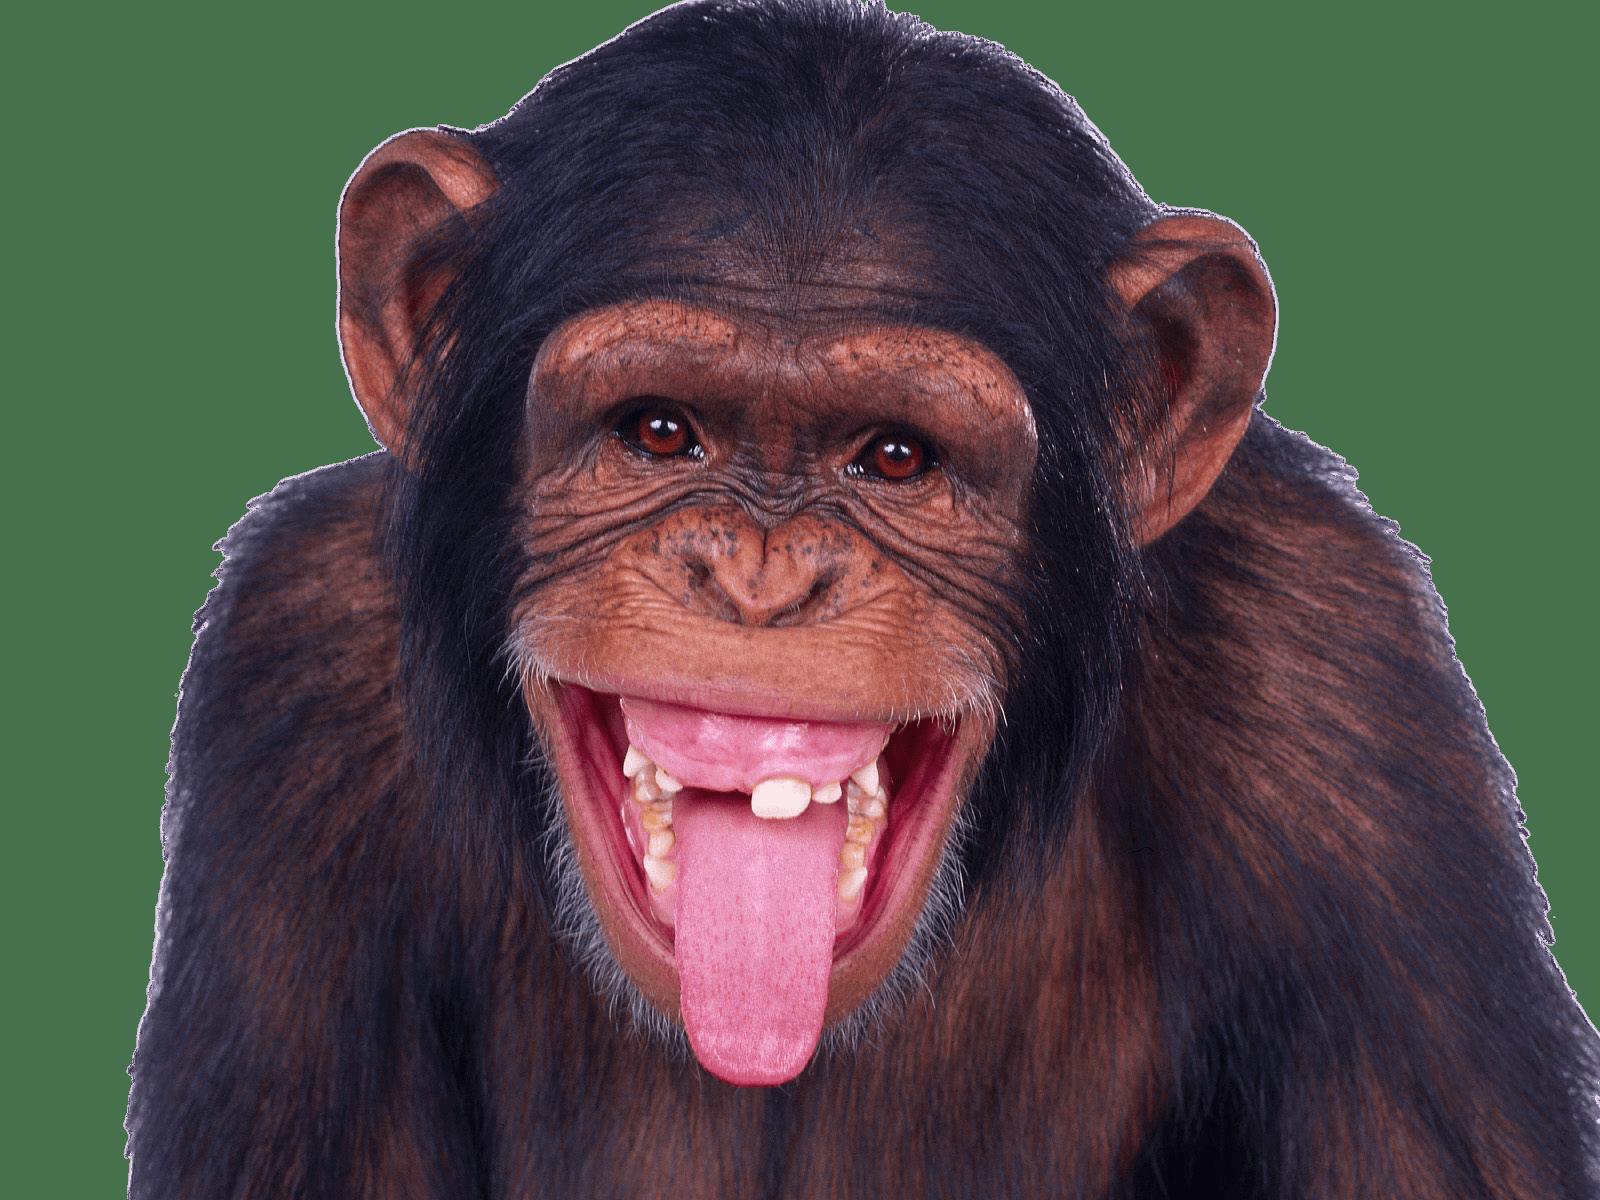 Chimpanzee Sticking Out Tongue transparent PNG.